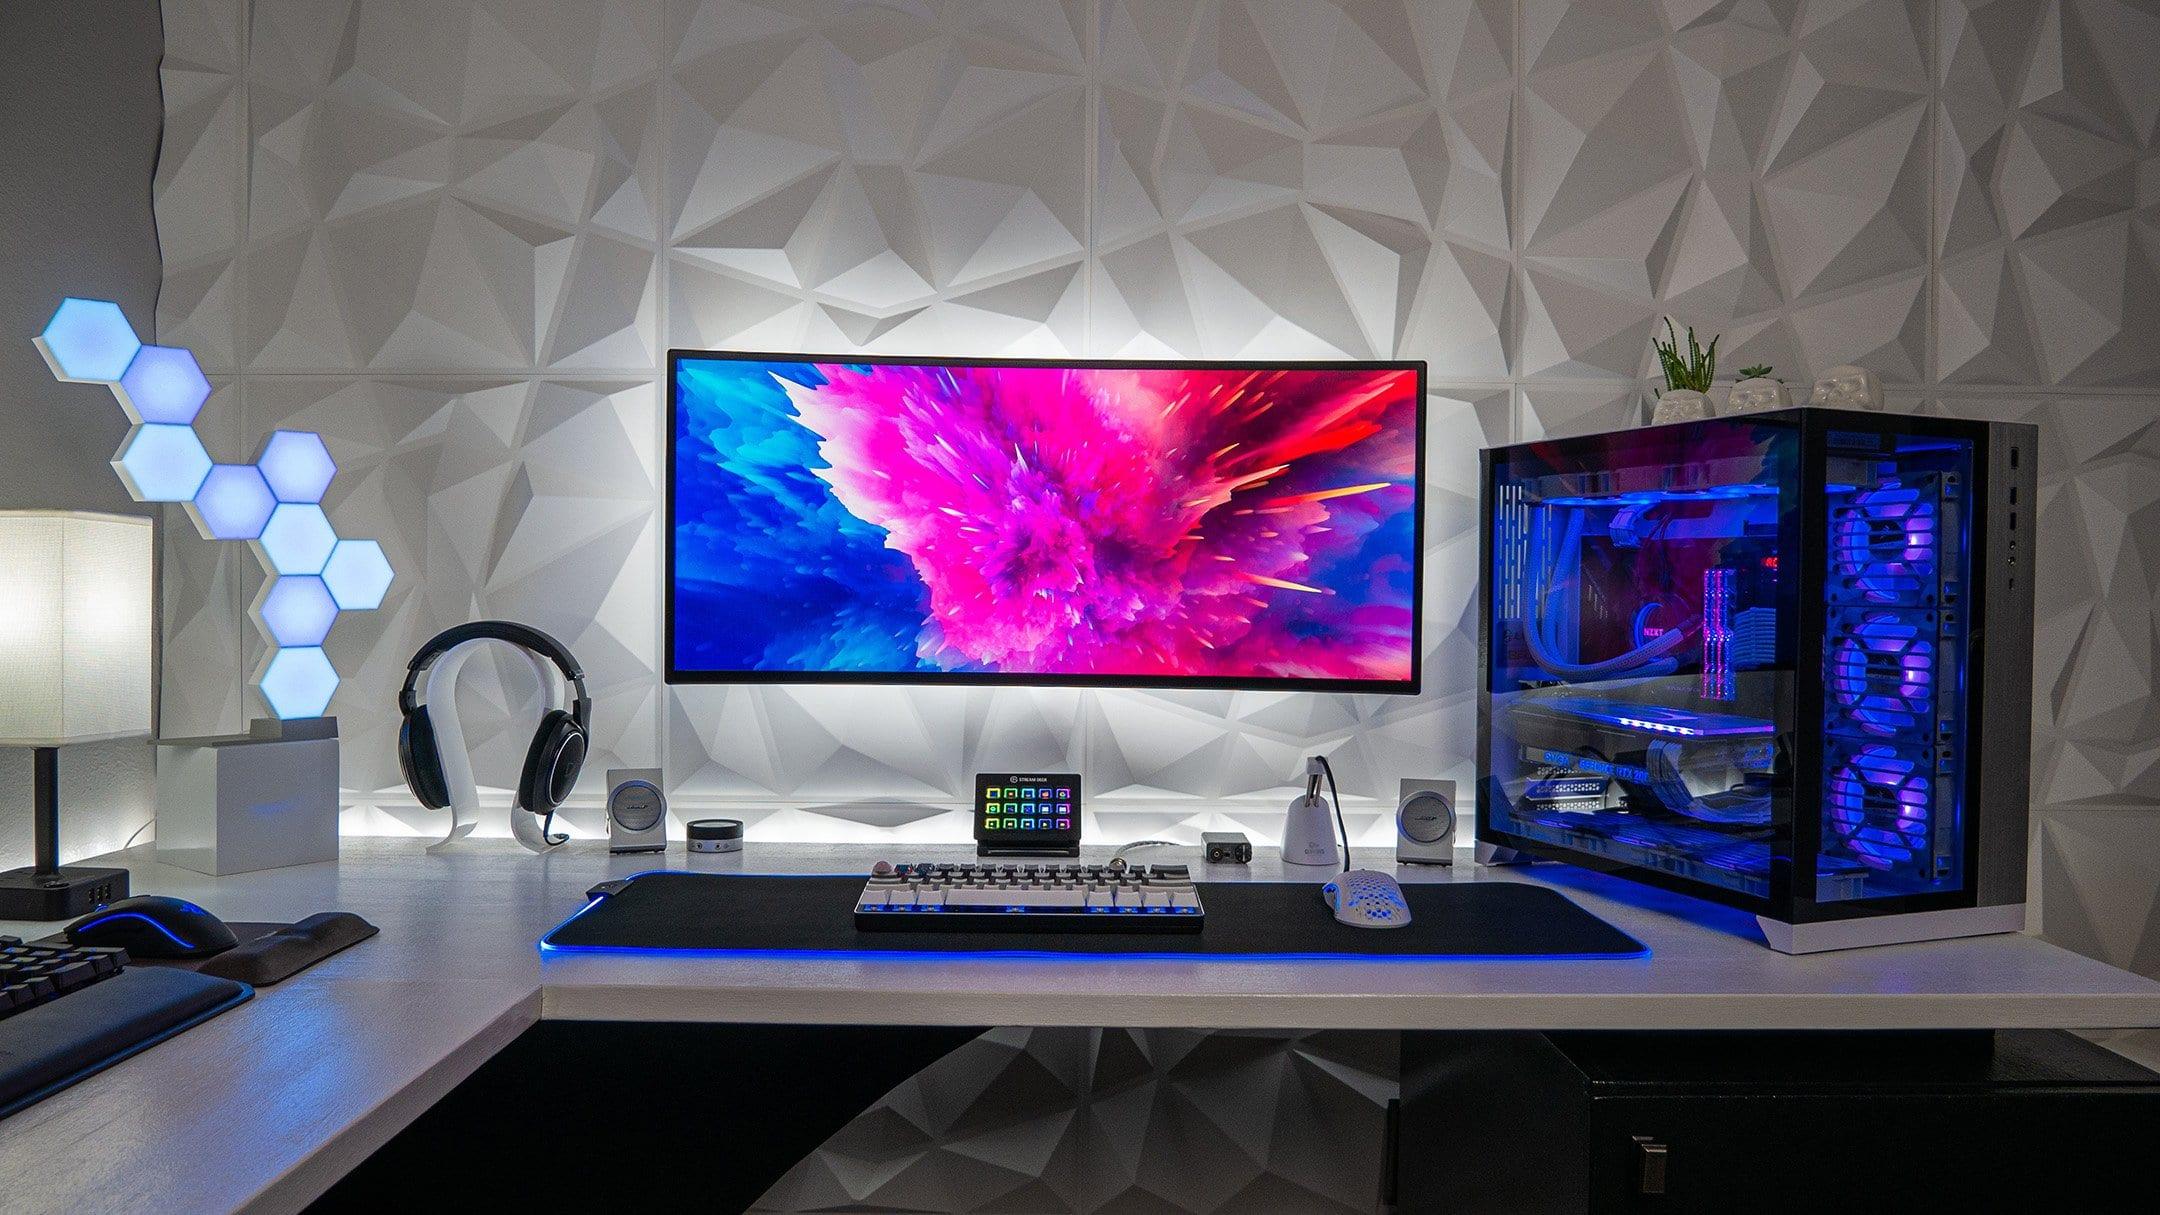 PC_Battlestations (Desk Setup)